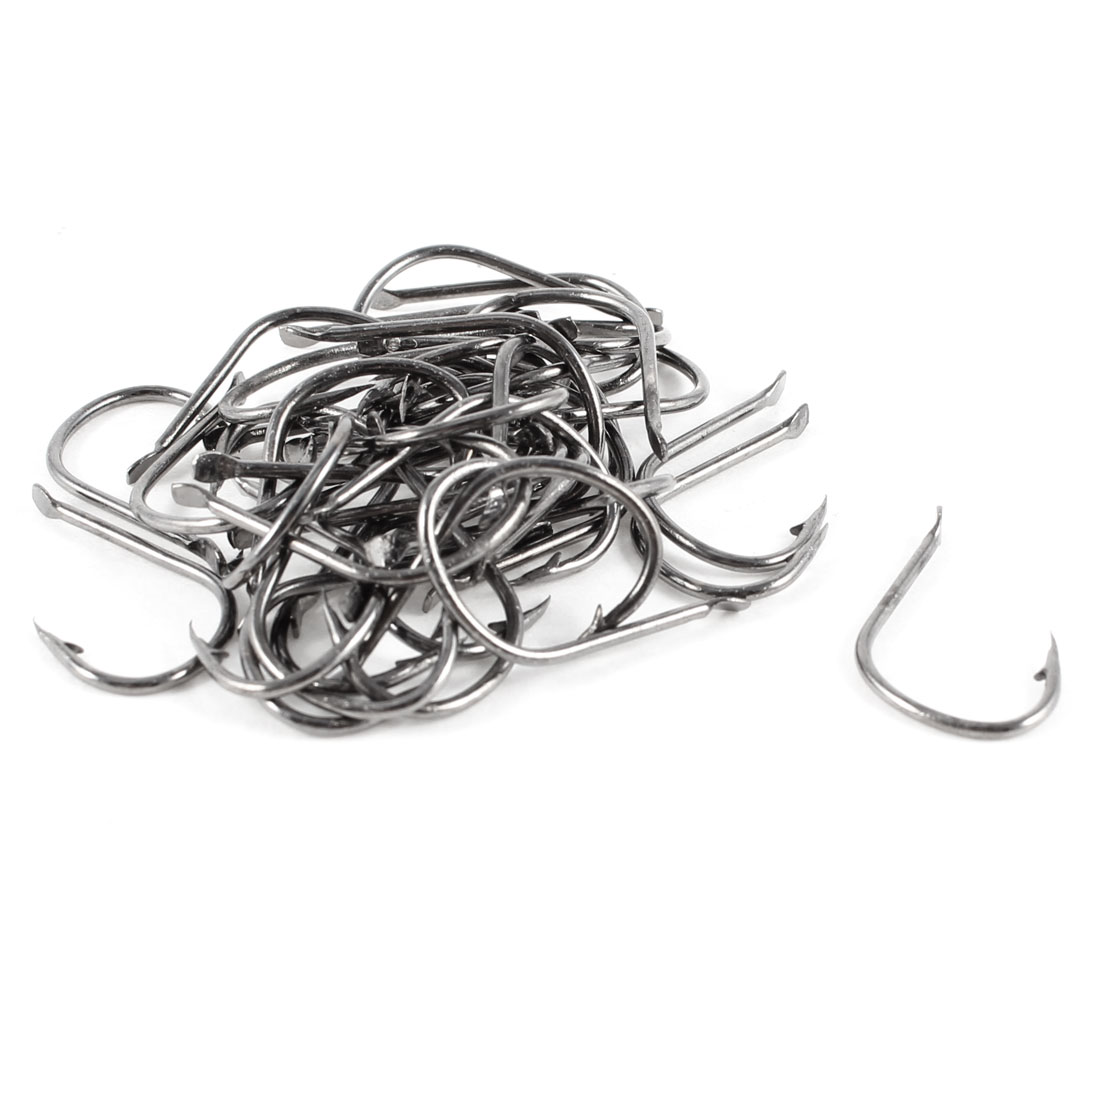 60 Pcs Fishing Eyeless Barbed Fish Hooks 9# w Clear Plastic Case